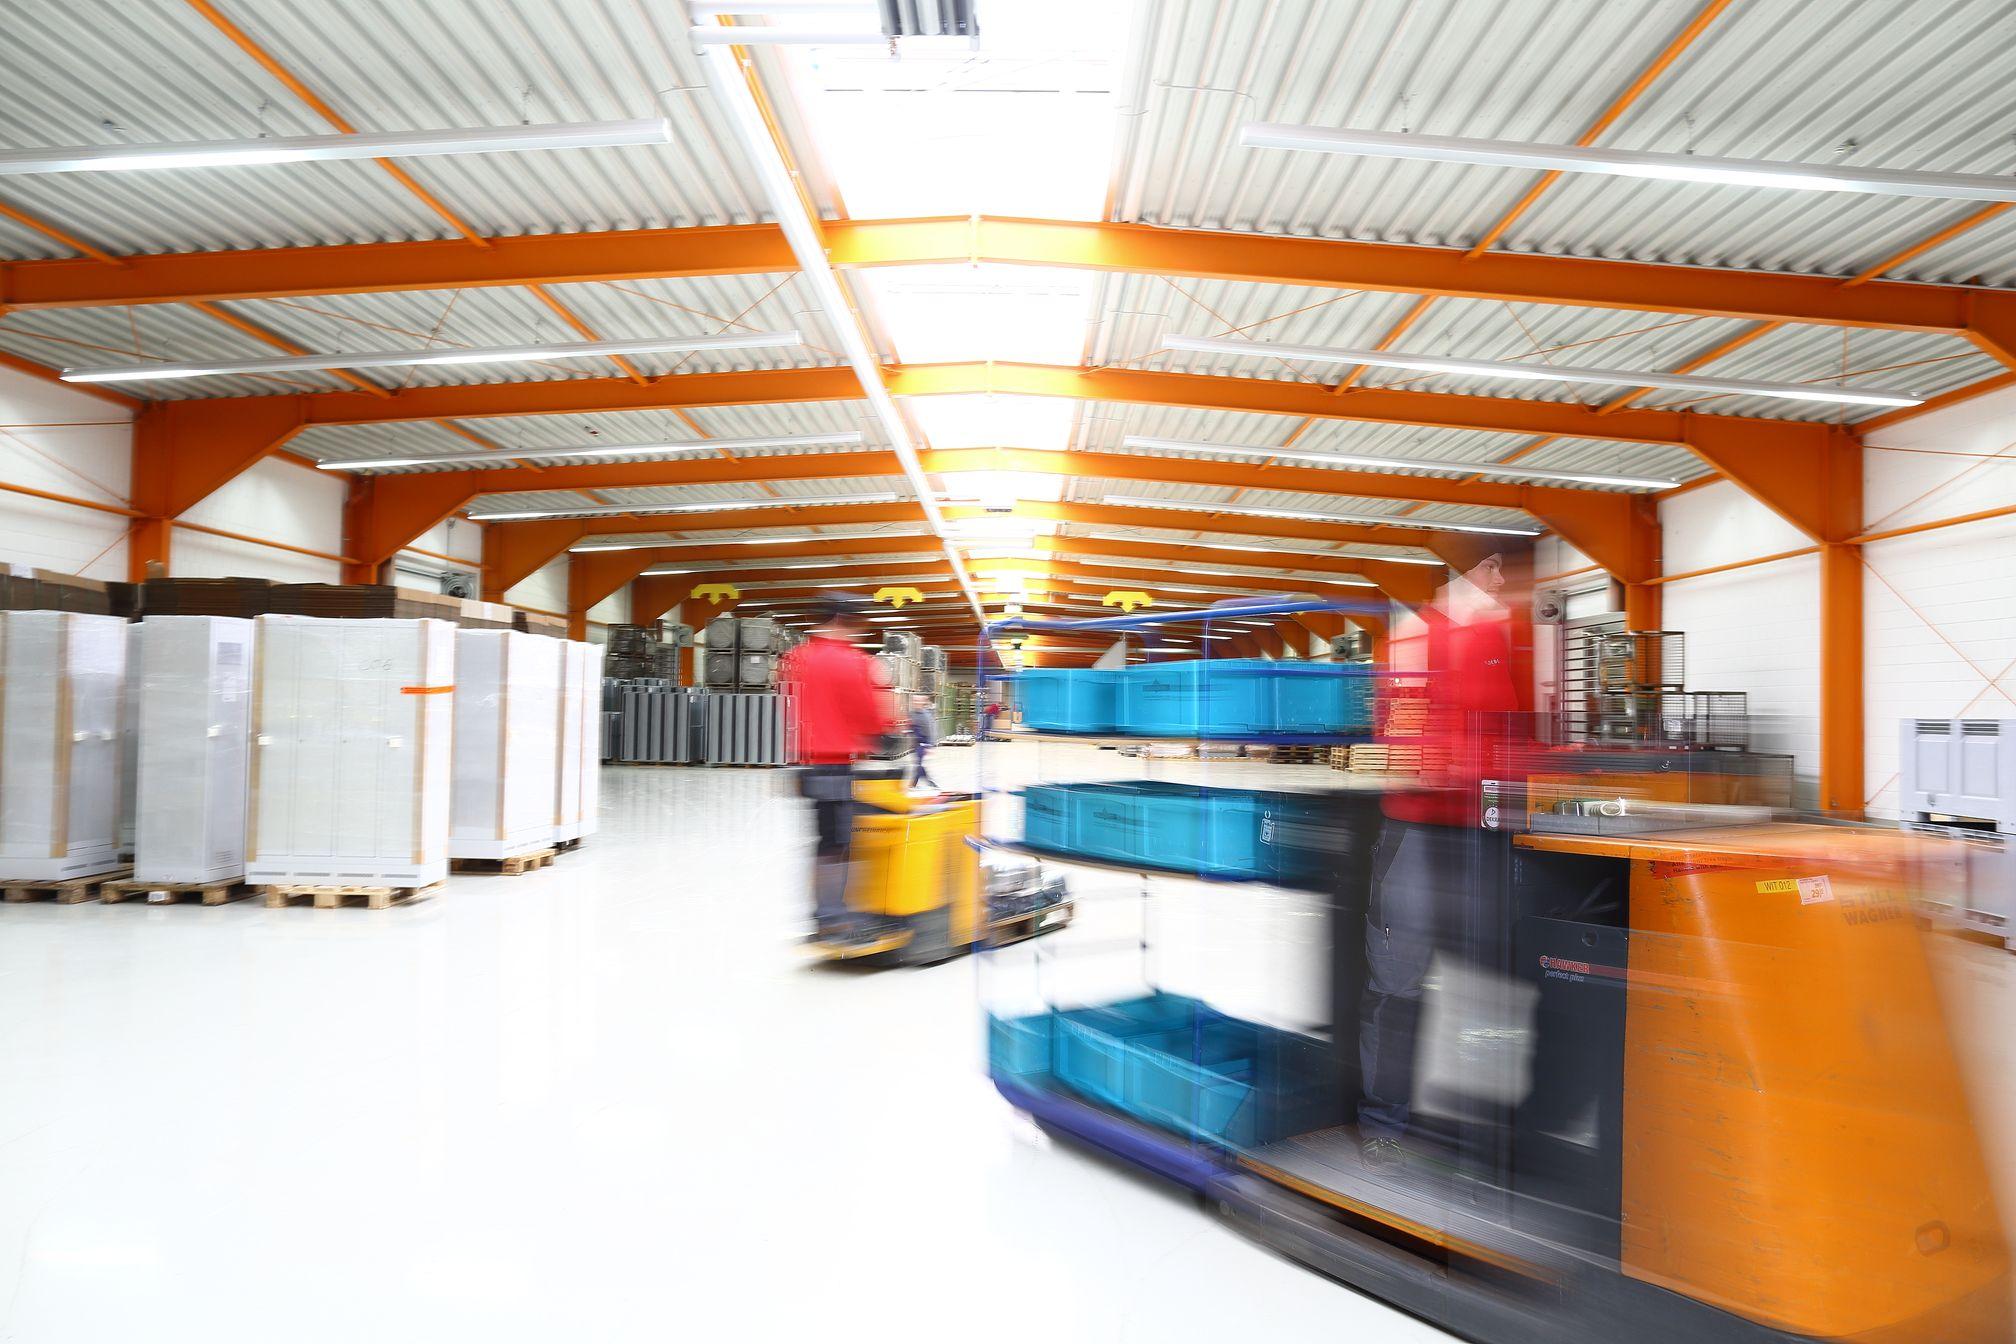 FS05_21012015_008.JPG – Wildeboer Bauteile GmbH